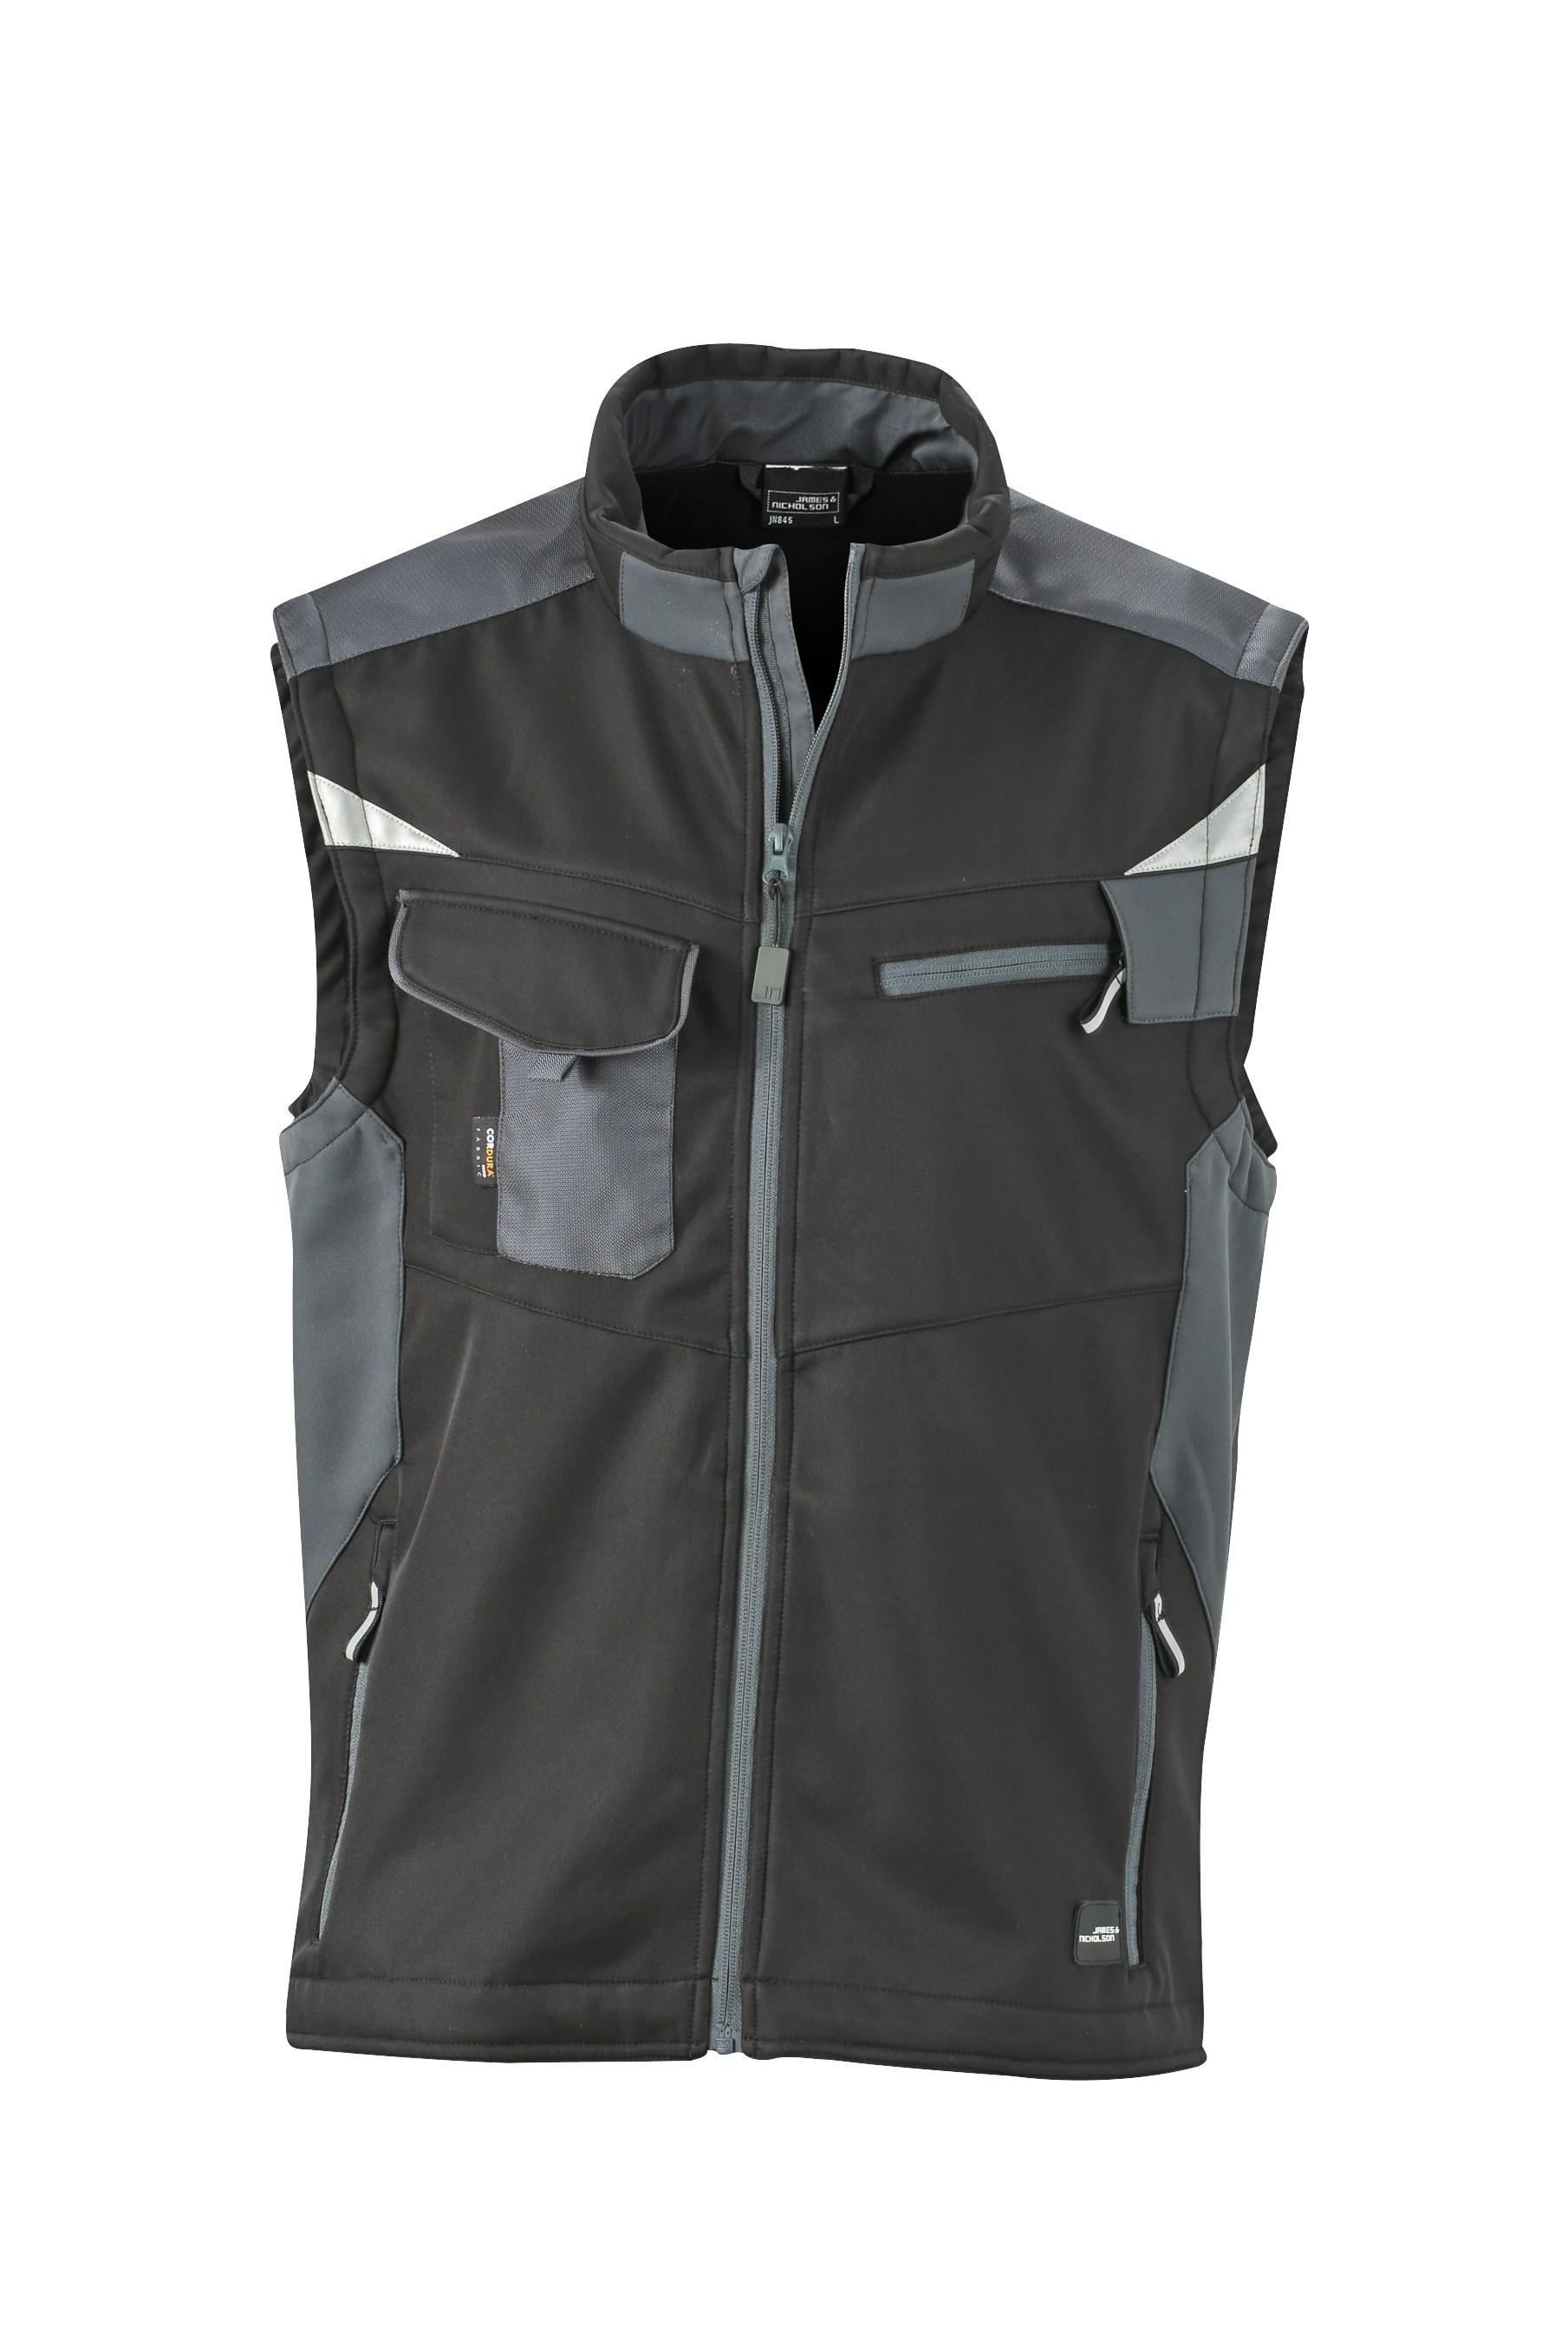 JN Softshellweste Workwear Unisex